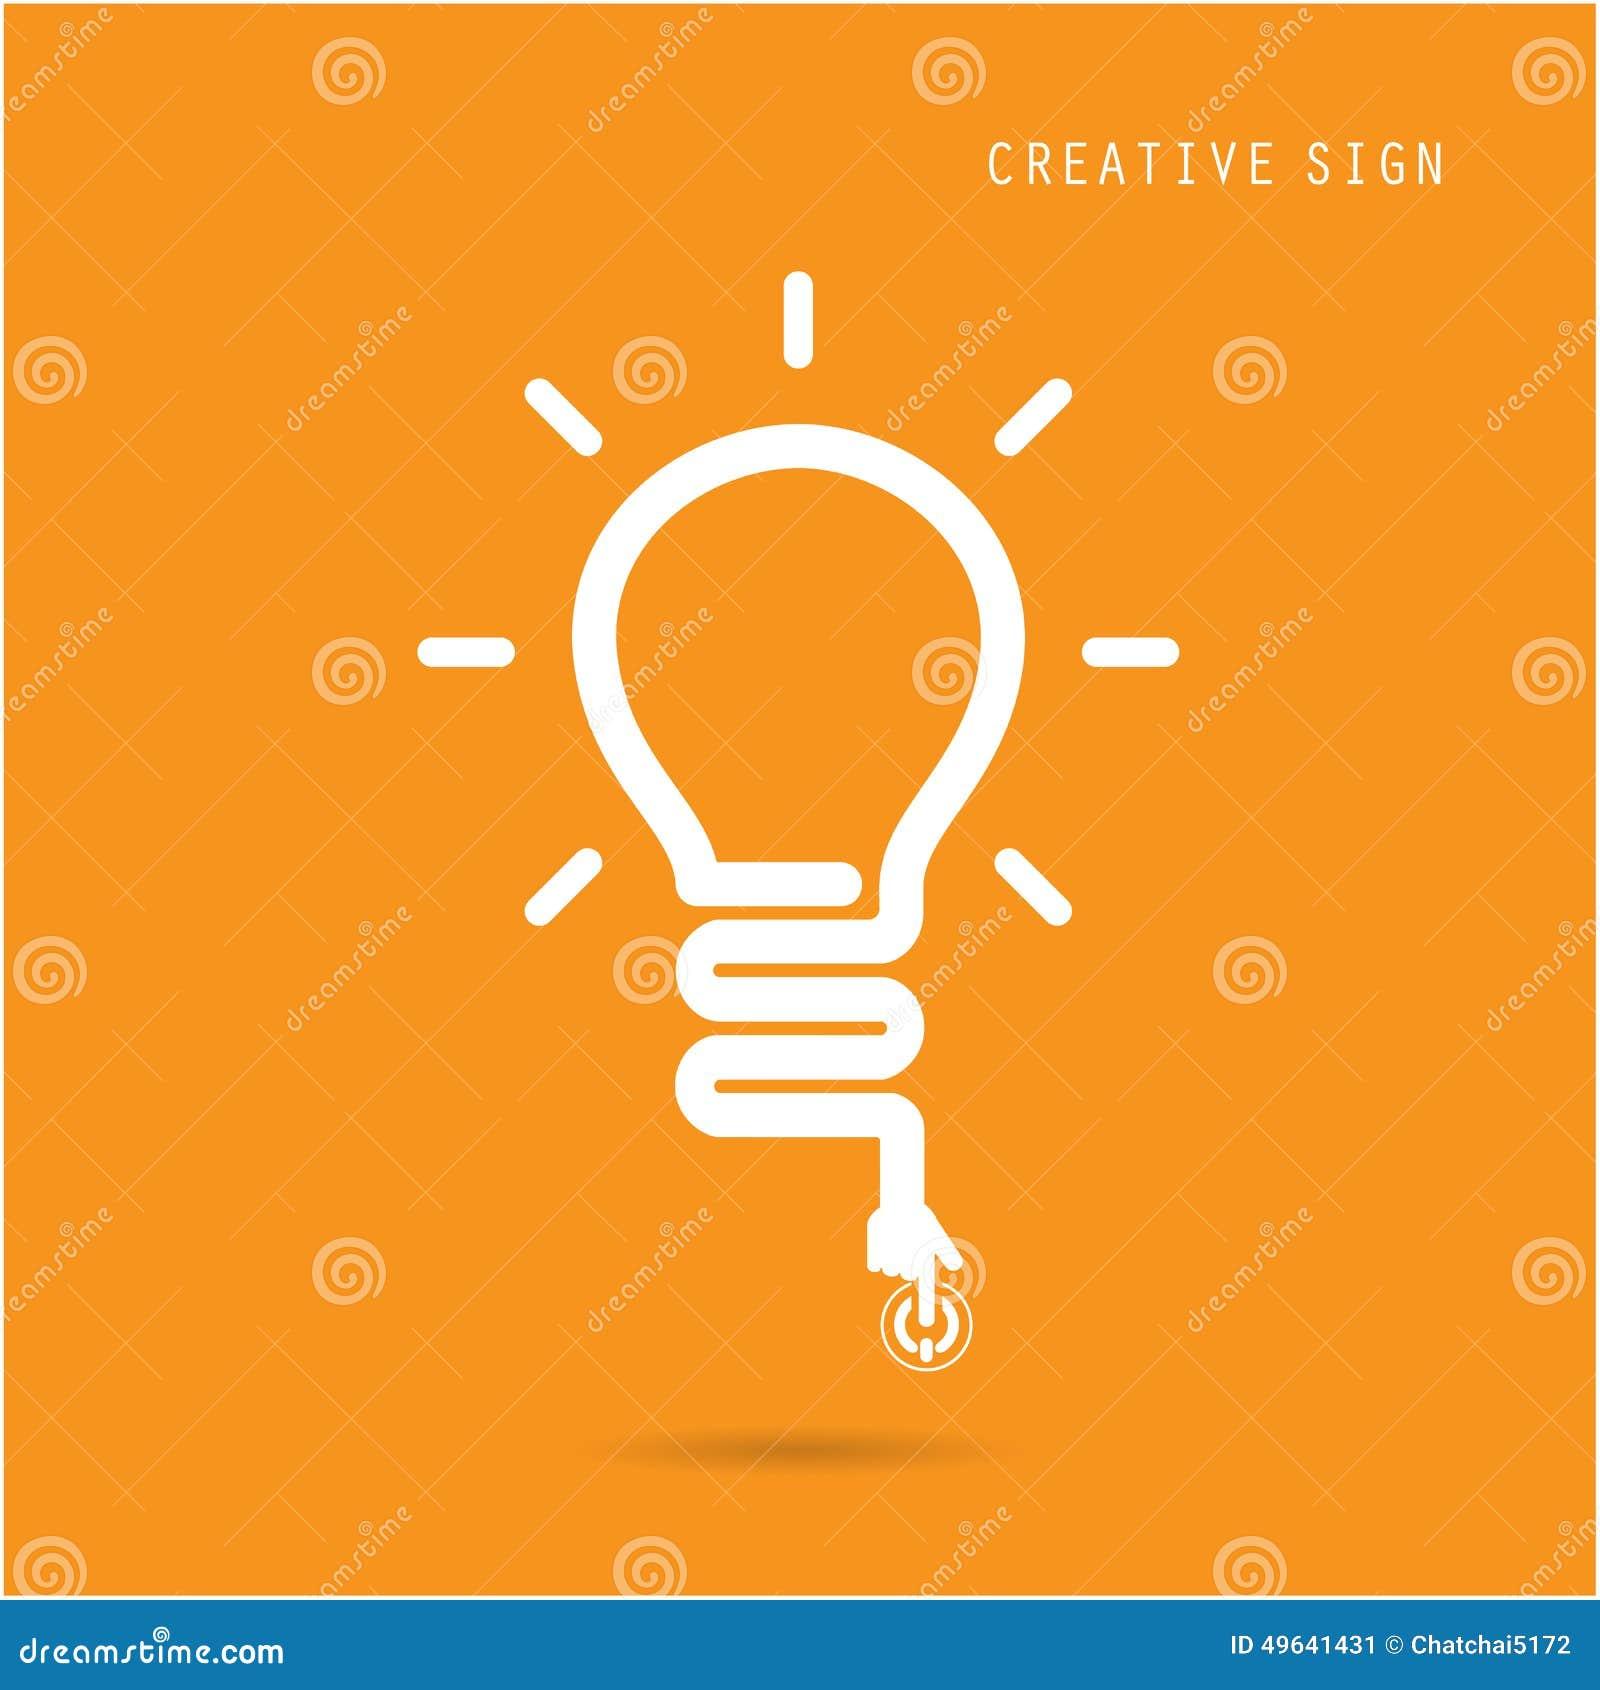 Creative Light Bulb Concept Design For Poster Flyer Cover